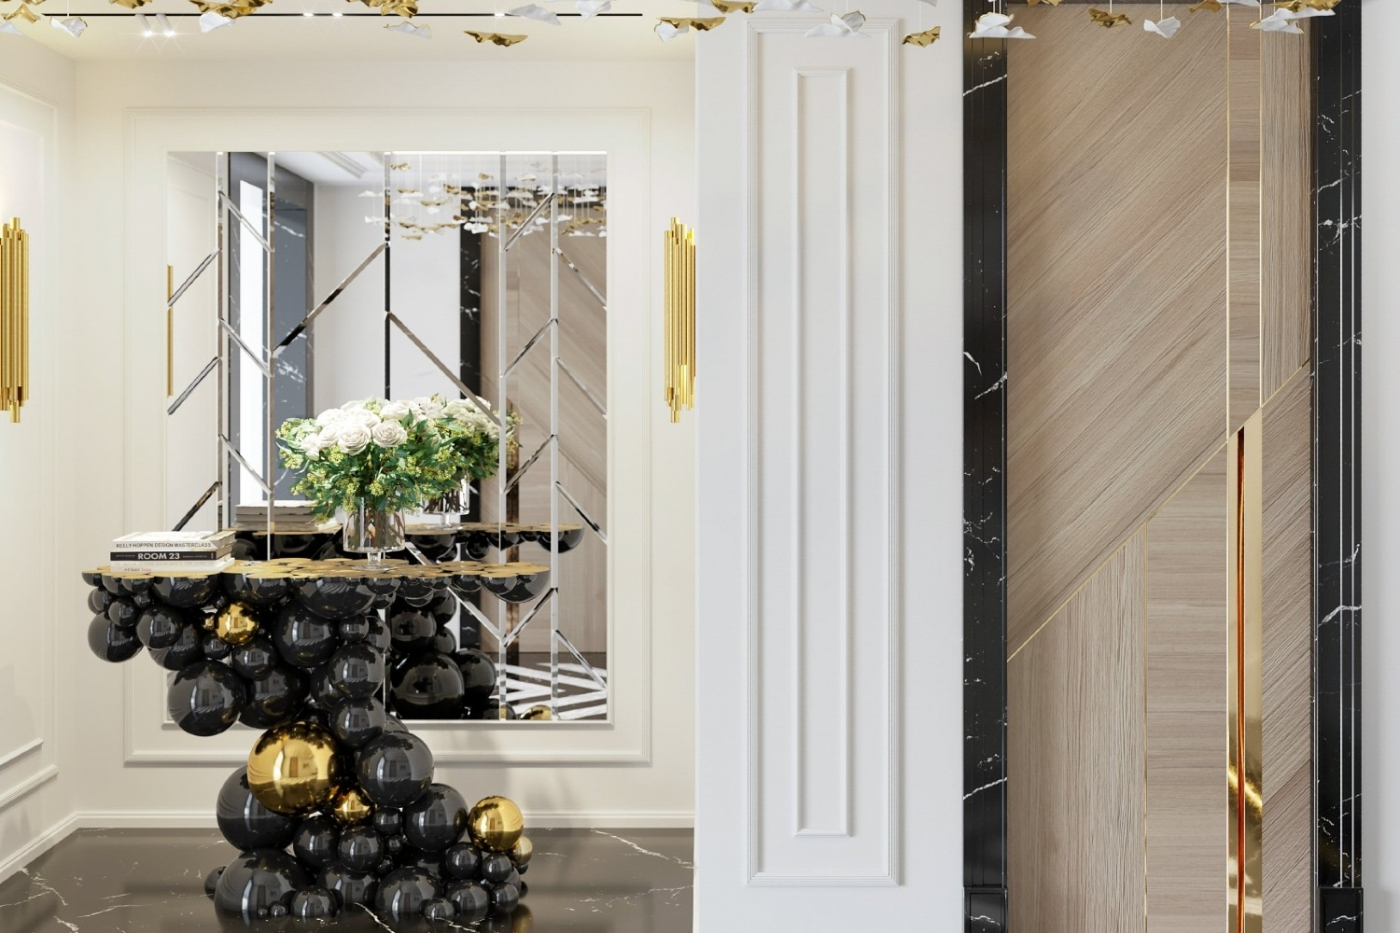 Imposing Furniture Design Pieces To Enhance Your Home Decor ft furniture design Imposing Furniture Design Pieces To Enhance Your Home Decor Imposing Furniture Design Pieces To Enhance Your Home Decor ft 1400x933